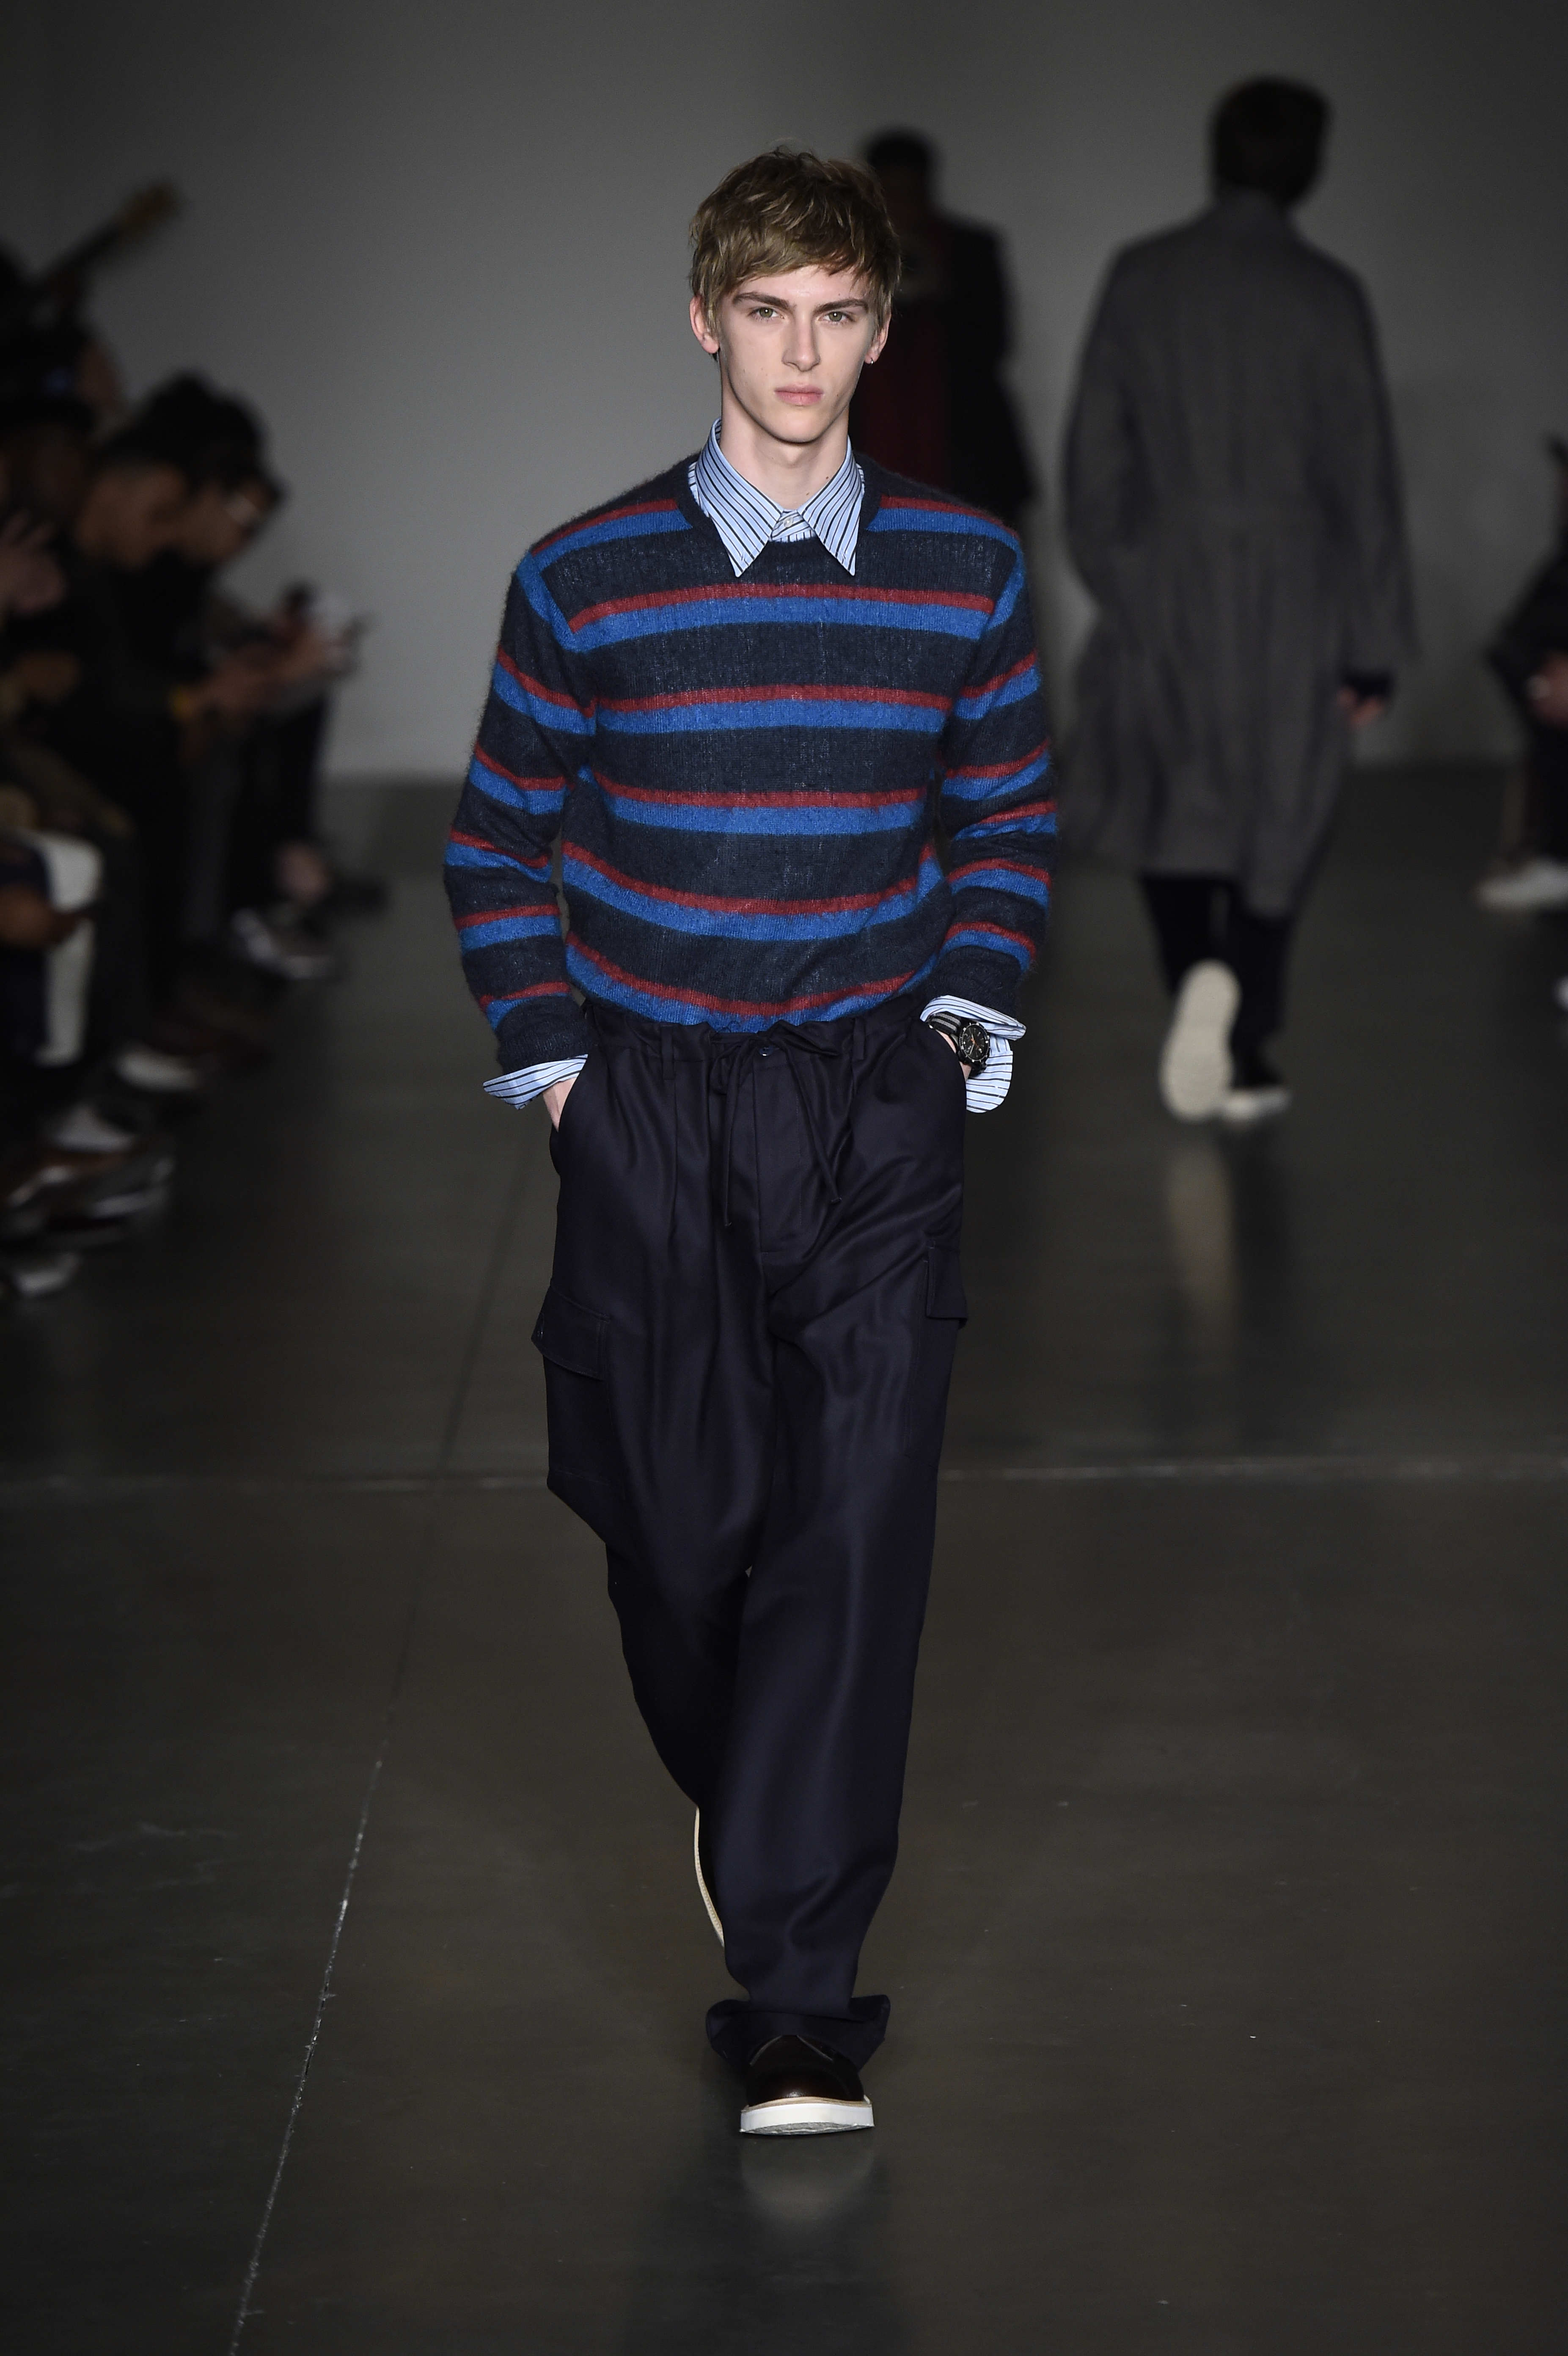 2018 Autunno Inverno 2018 19 New York Fashion Week Men s - MFFashion.com be45827bcc0